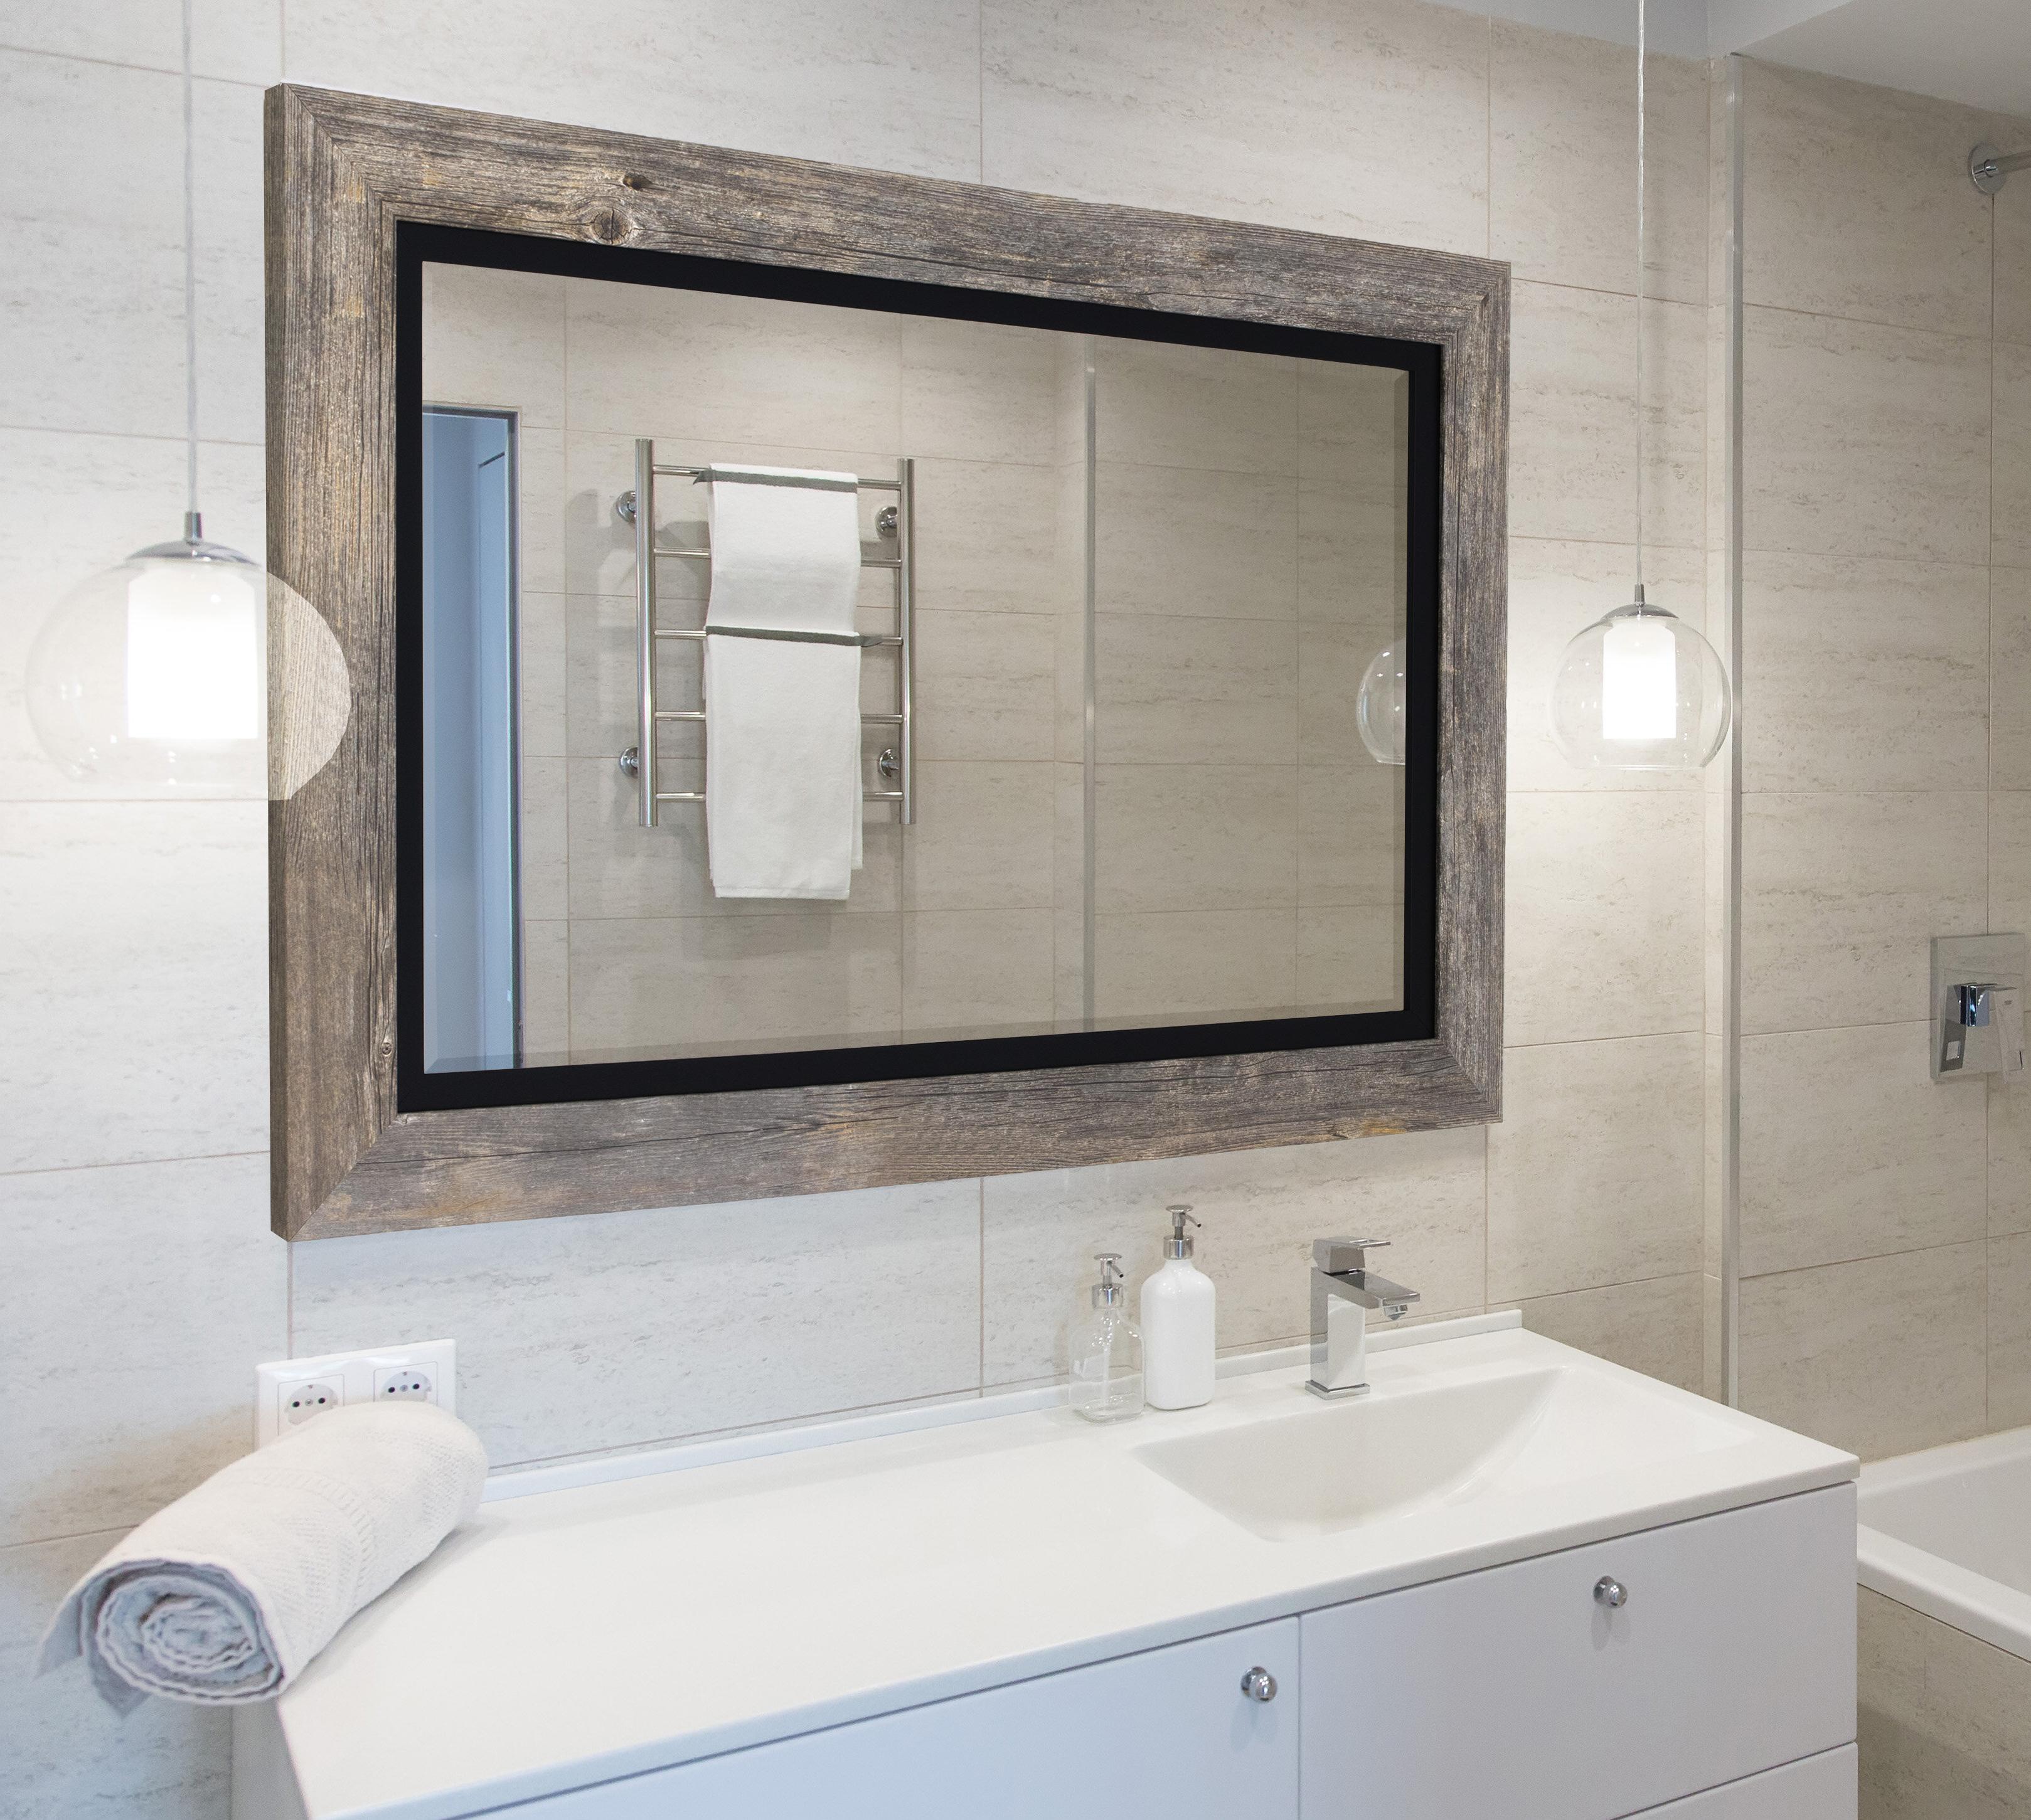 Newest Hilde Traditional Beveled Bathroom Mirror In Landover Rustic Distressed Bathroom/vanity Mirrors (View 15 of 20)